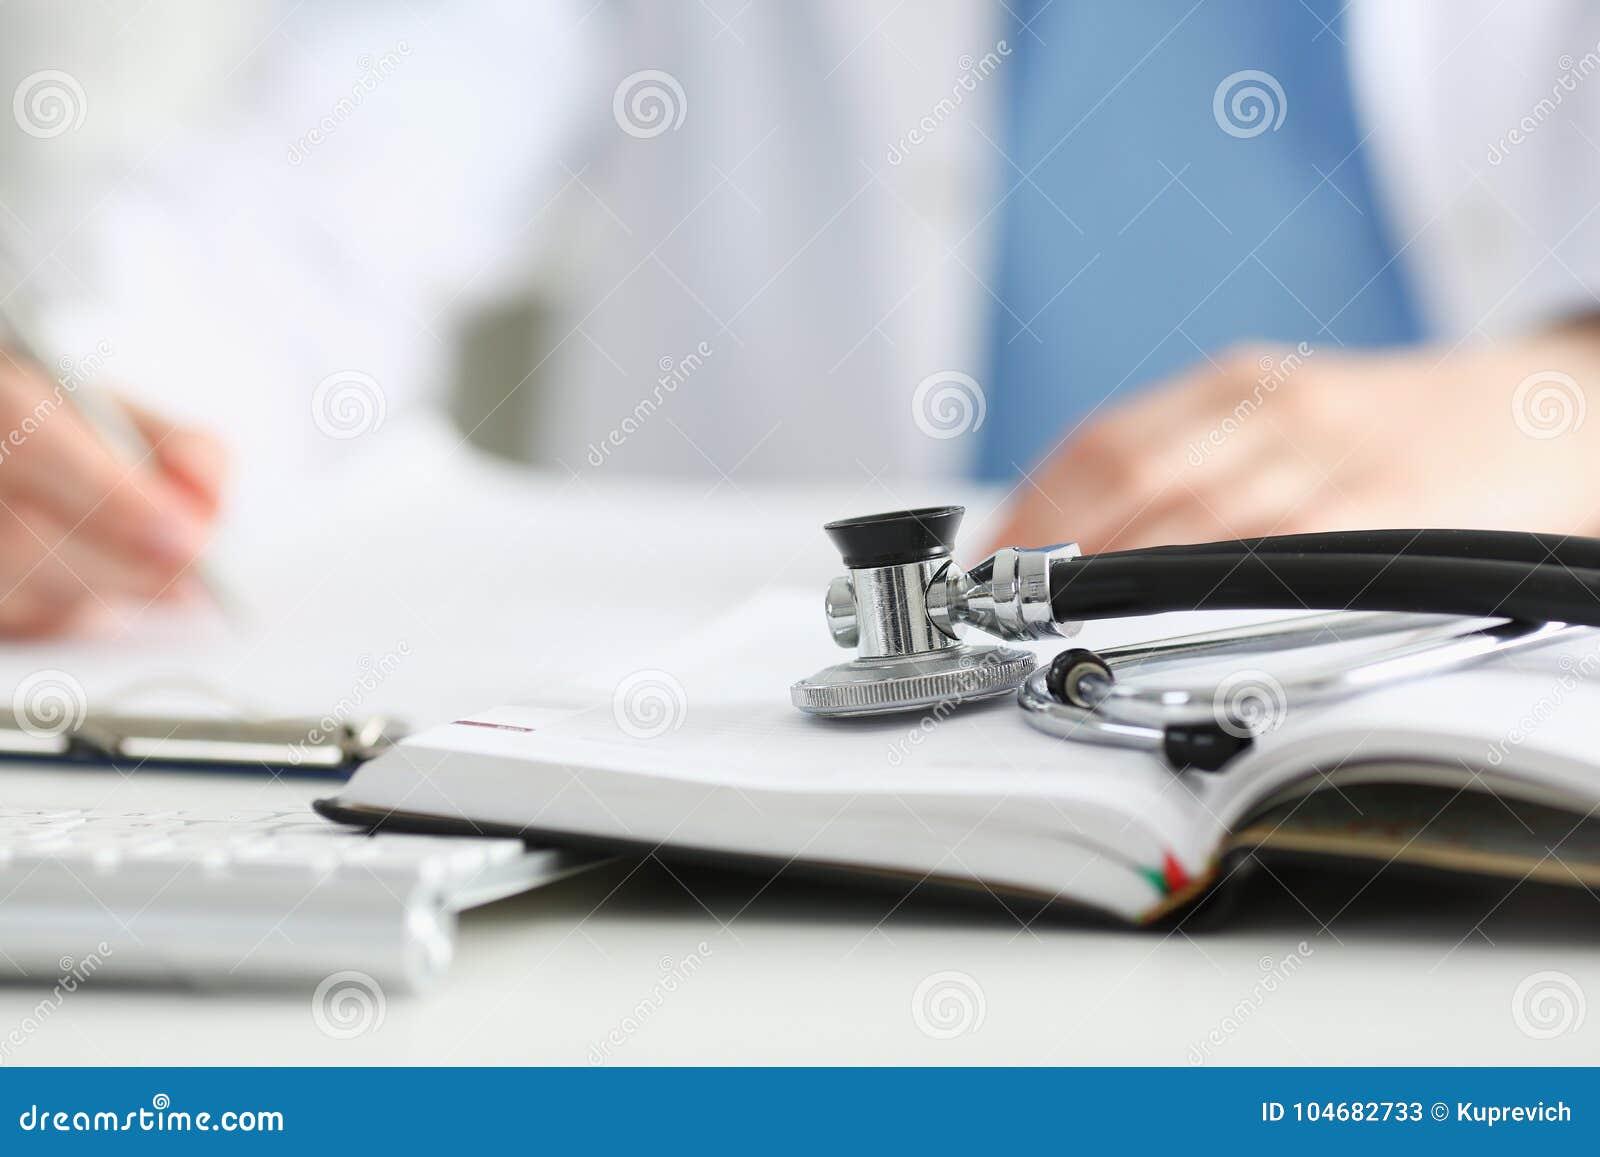 Stethoscope Head Lying On Medical Forms Stock Image - Image